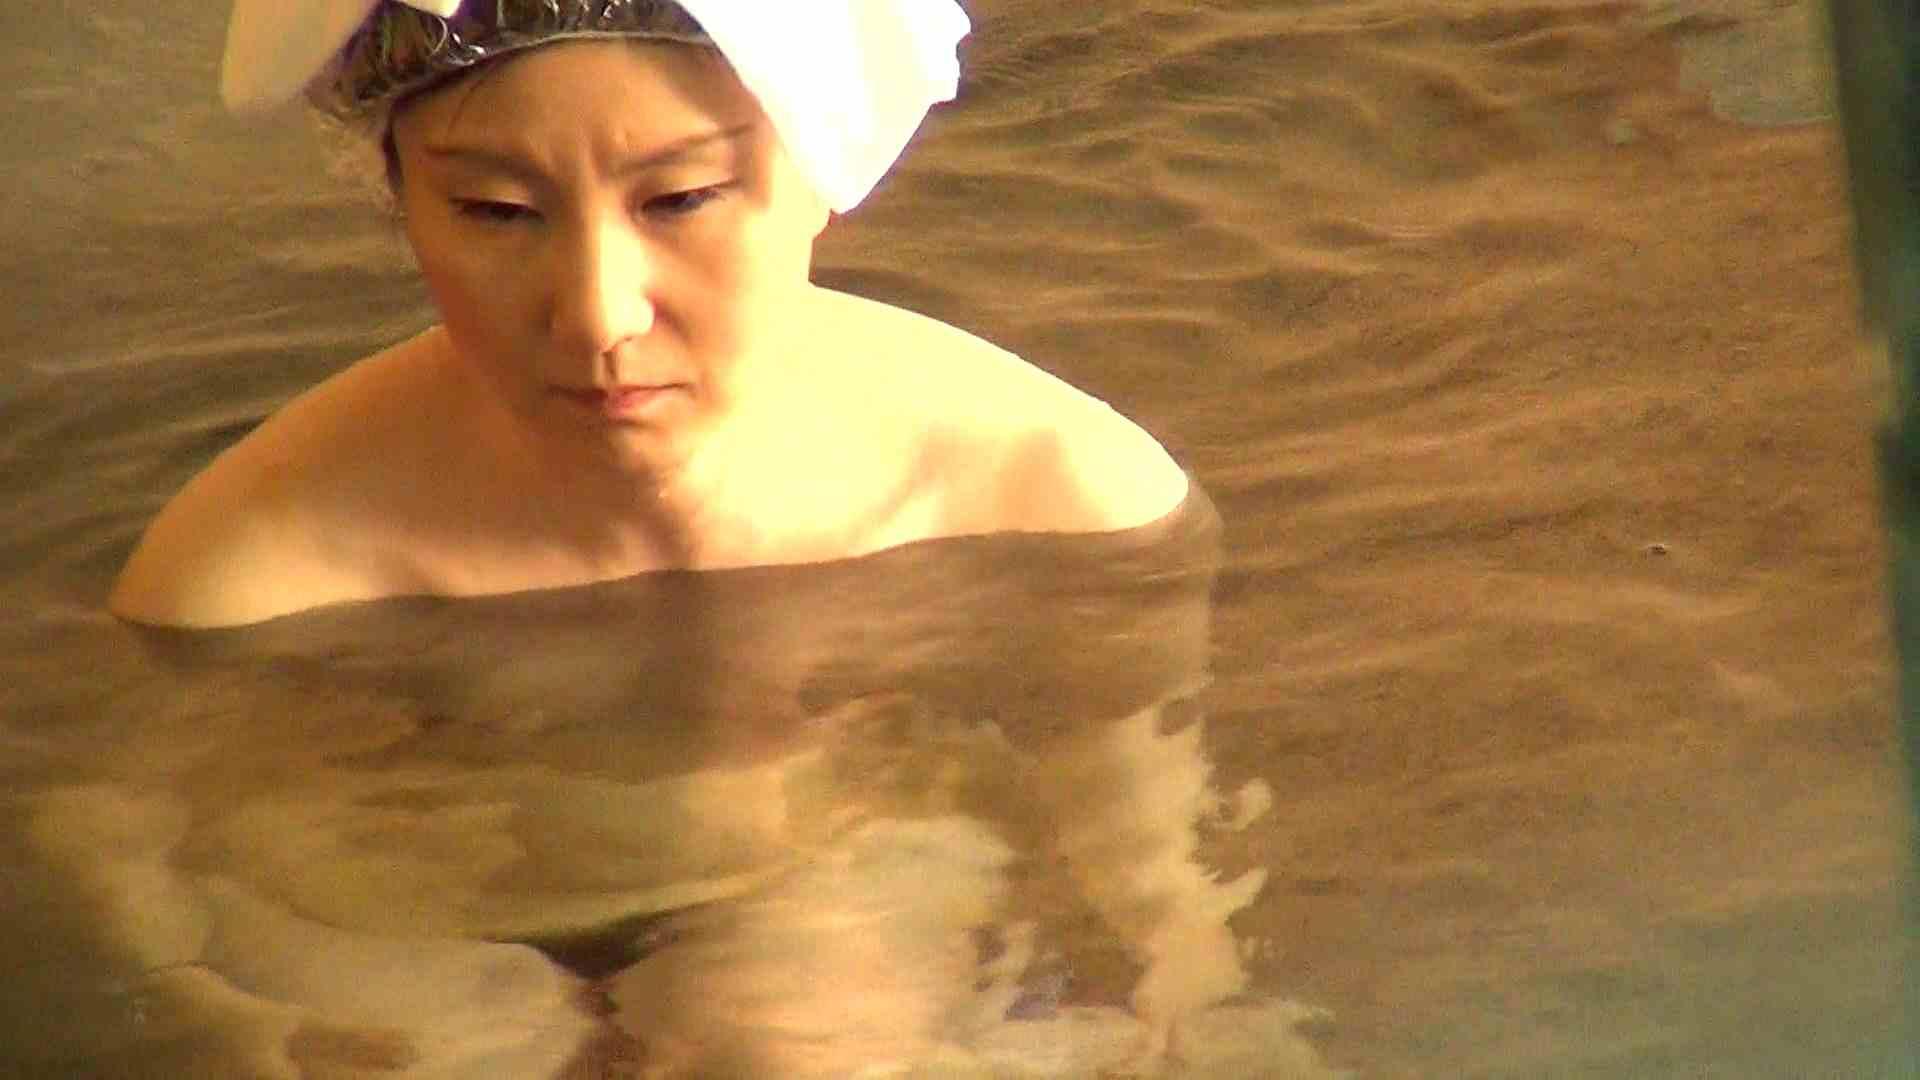 Aquaな露天風呂Vol.278 盗撮シリーズ | 露天風呂編  100PIX 49